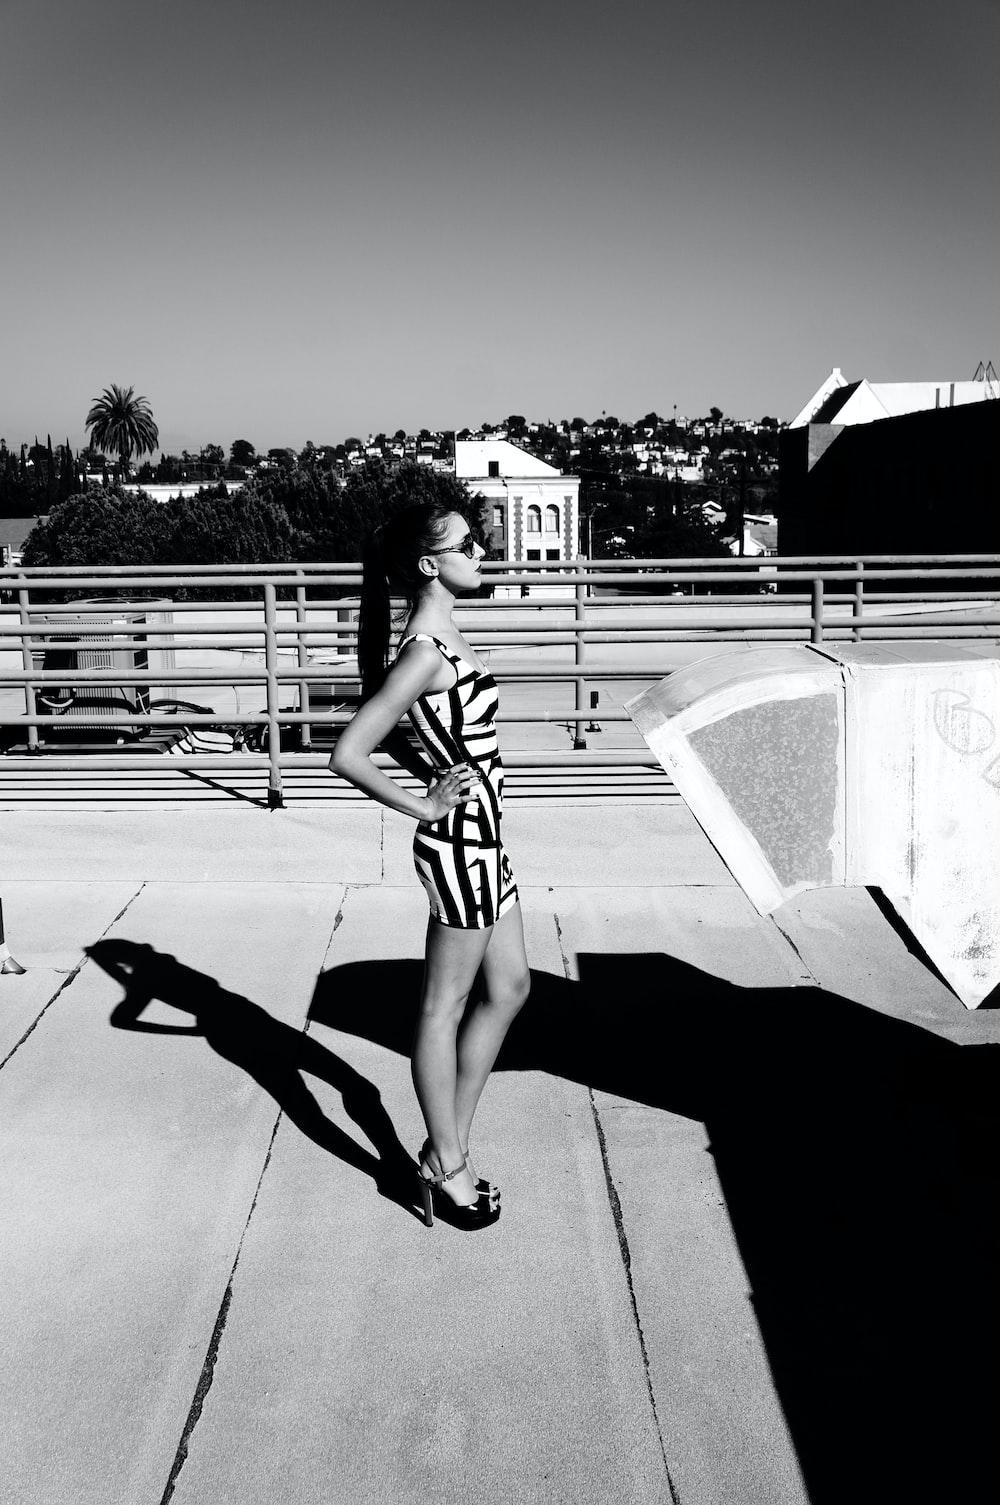 woman wearing skirt standing near railings